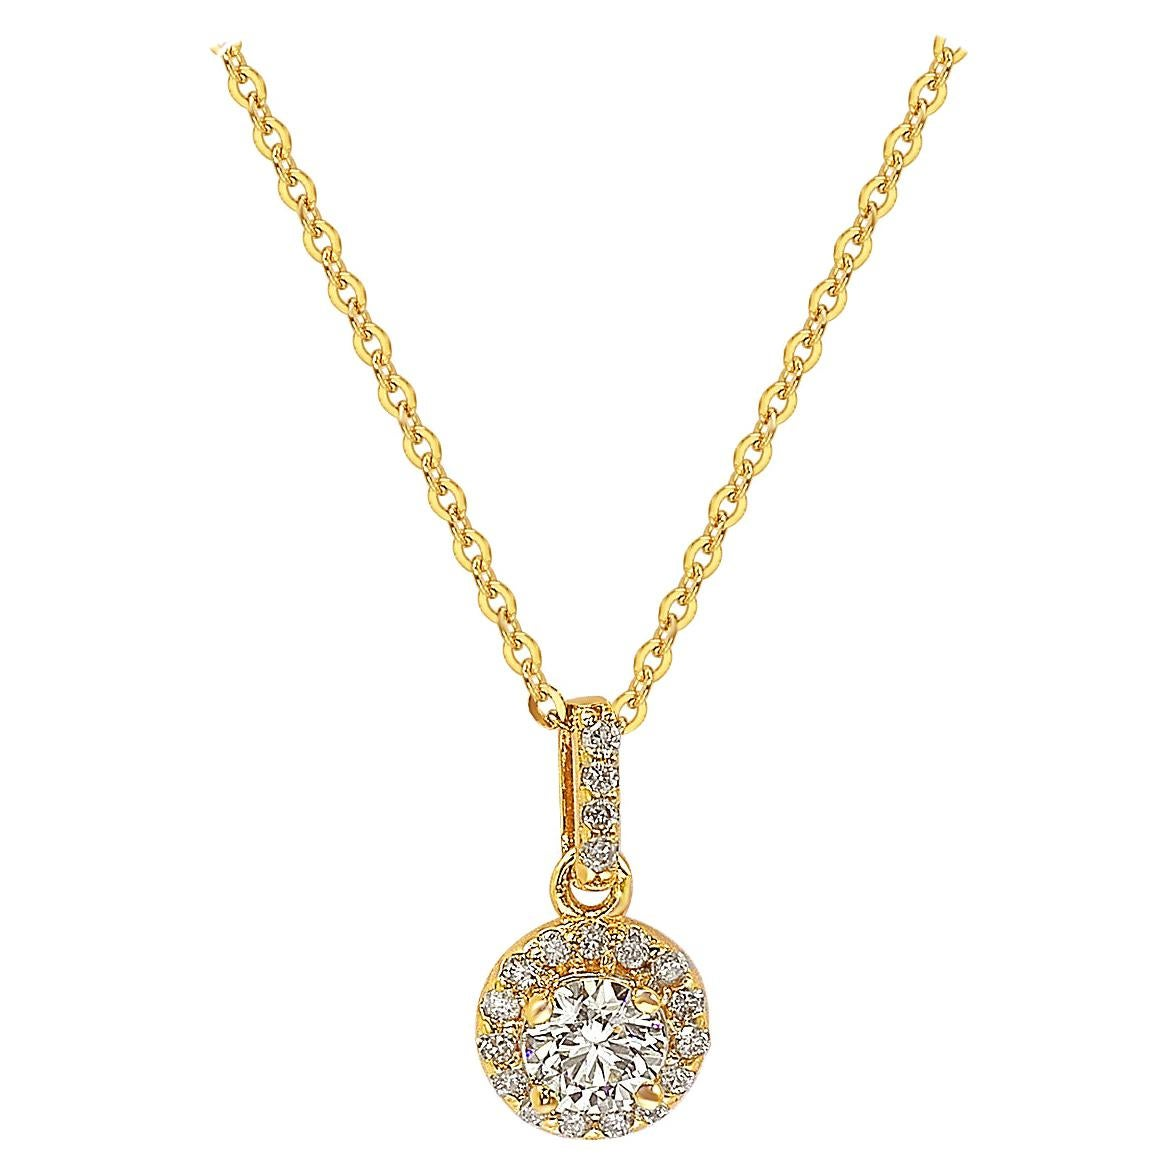 Suzy Levian 14k Yellow Gold White Diamond Halo Pendant